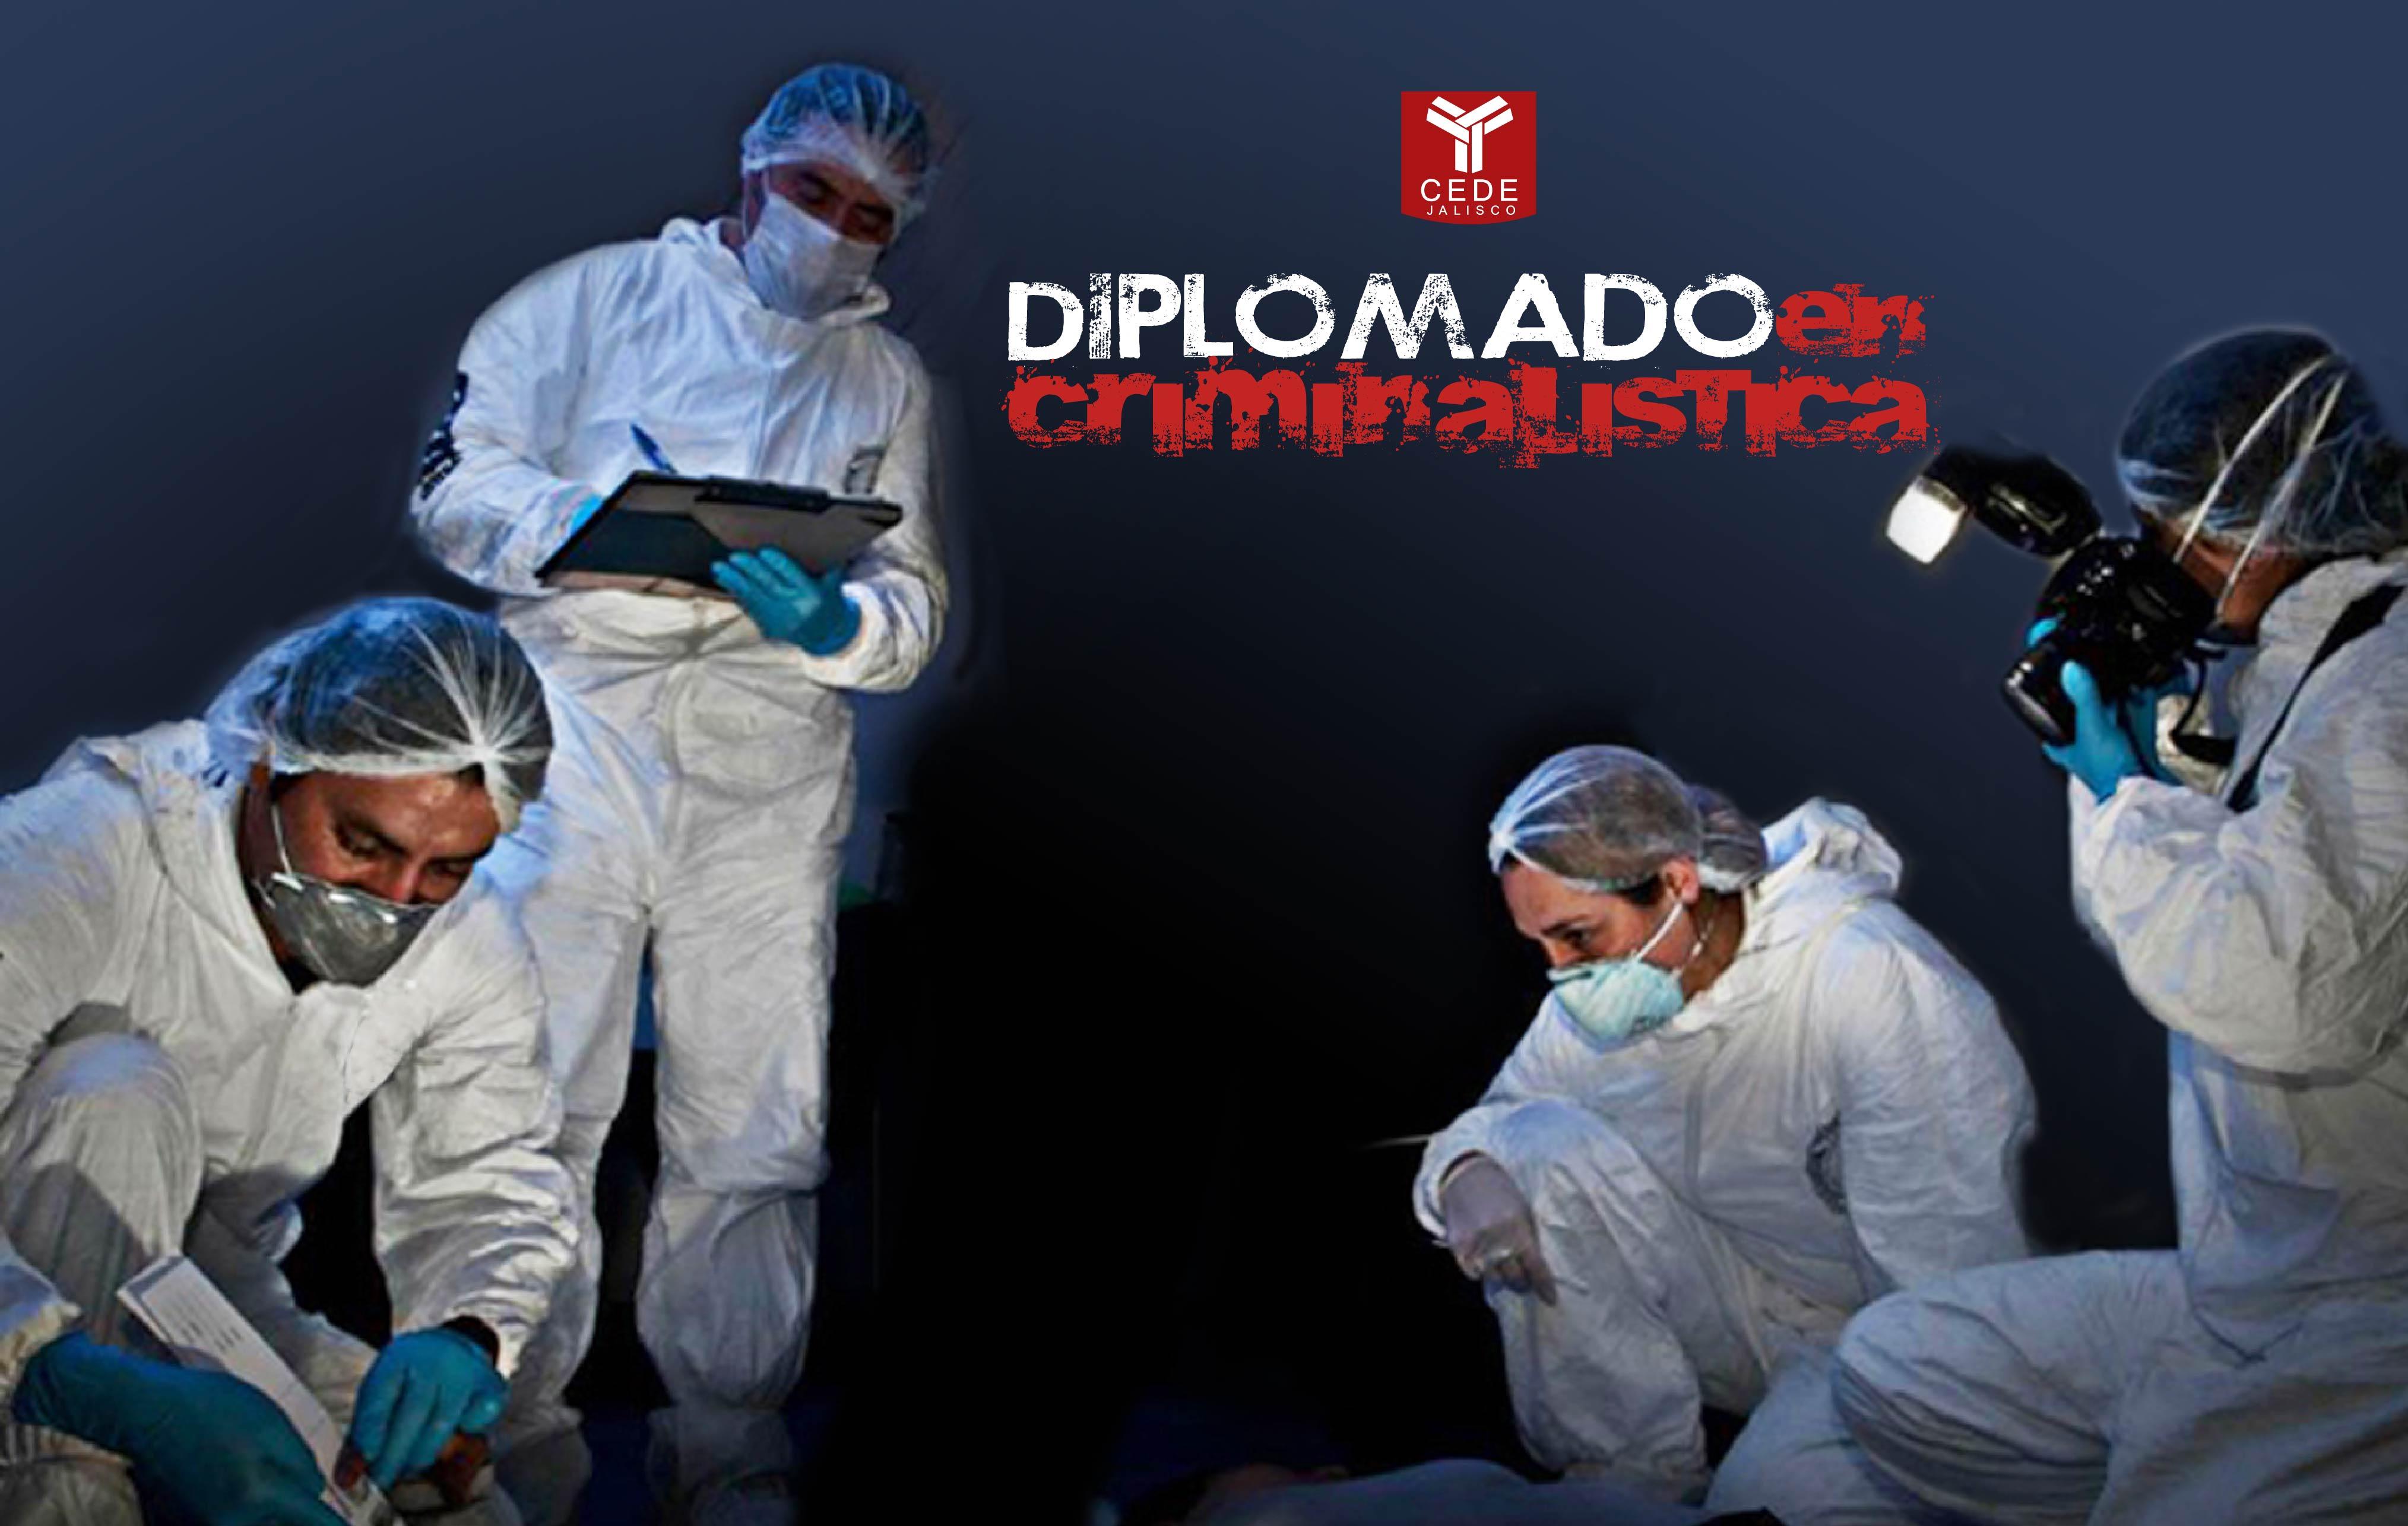 DIPLOMADO EN CRIMINALÍSTICA. MAESTROS ESPECIALIZADOS